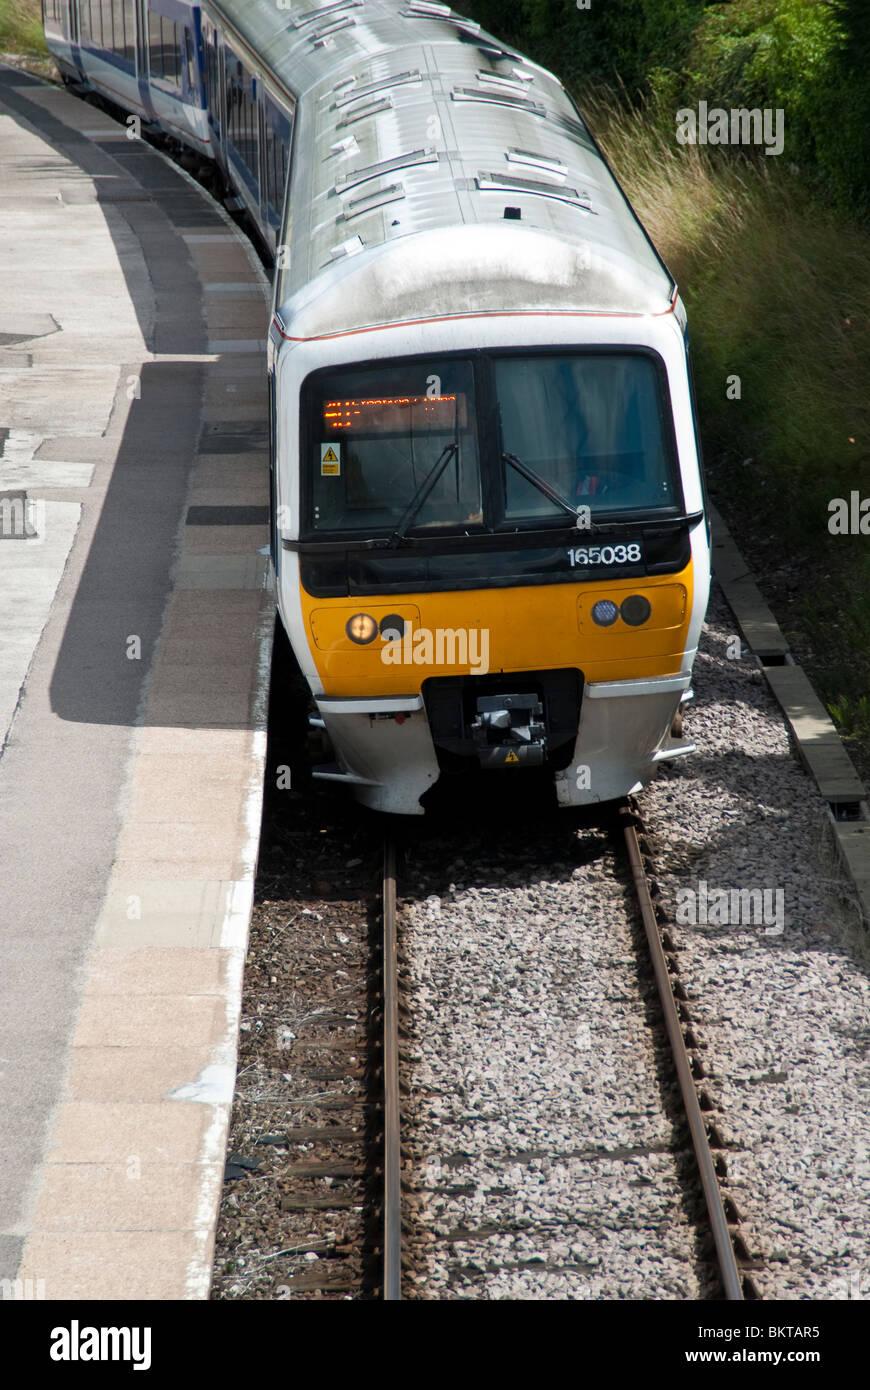 Chiltern trains multi unit - Stock Image